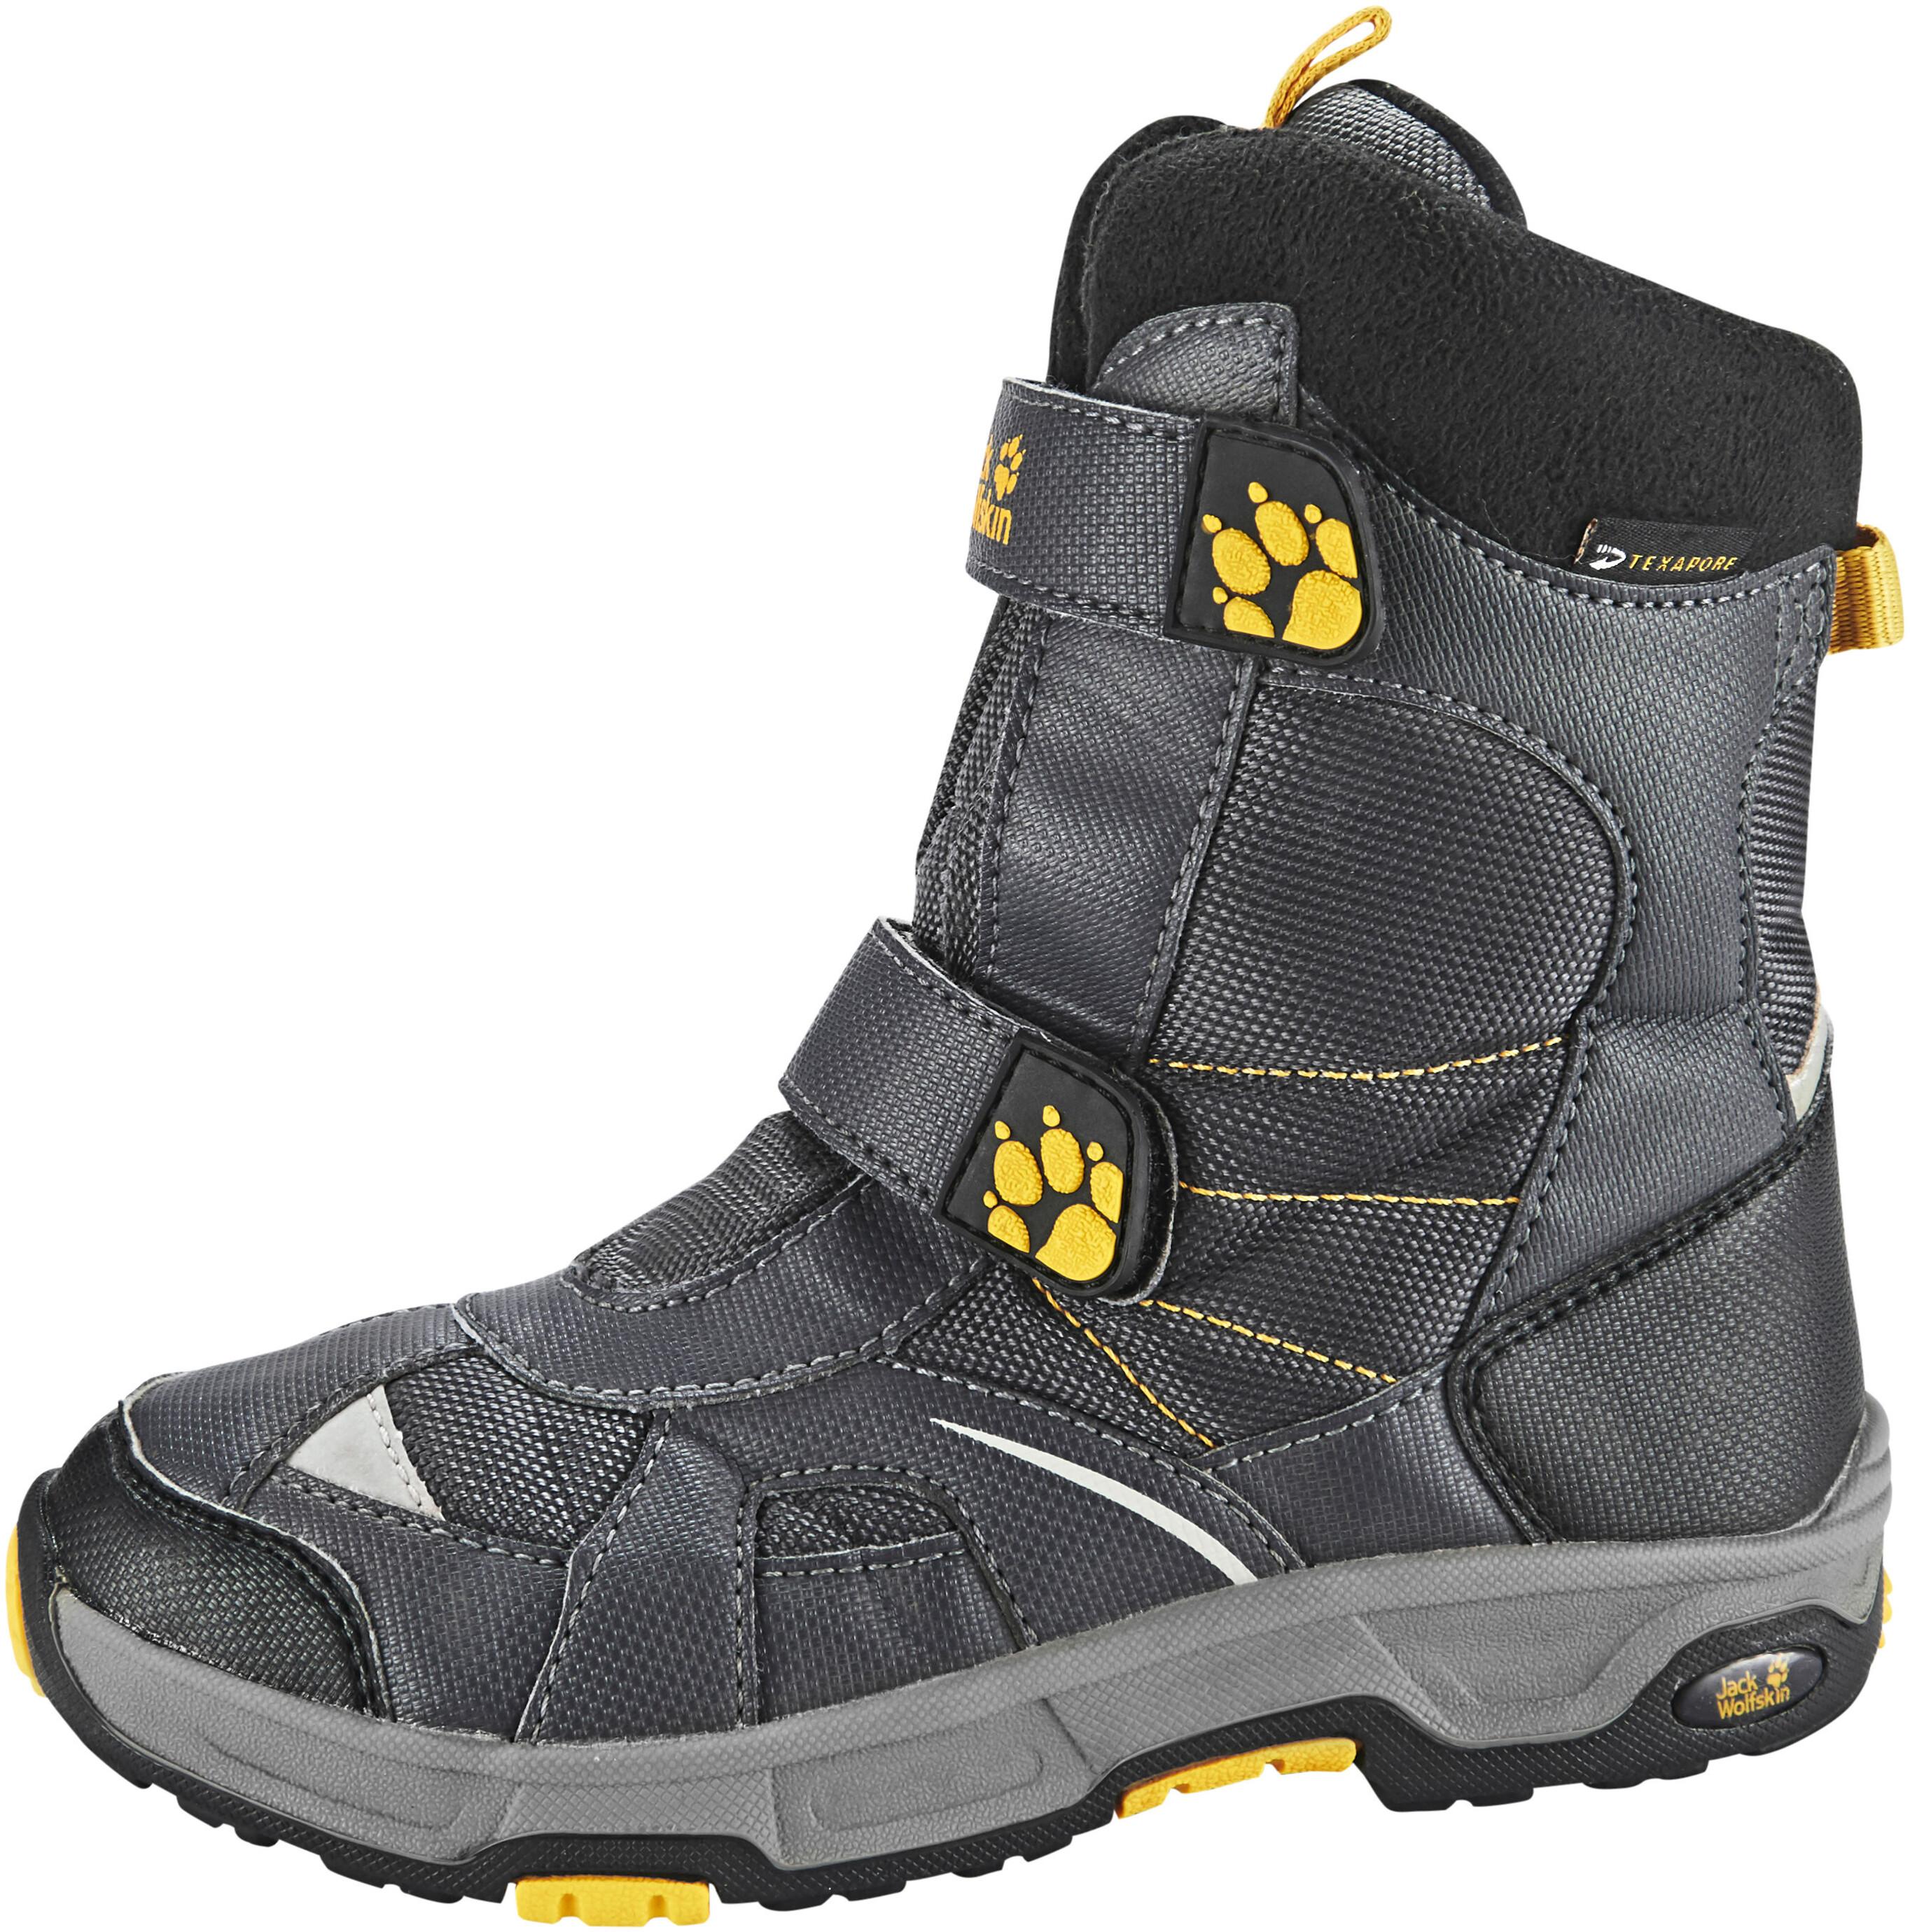 9ec9d3010ad793 Jack Wolfskin Polar Bear Texapore Winter Boots High Cut Boys burly yellow XT